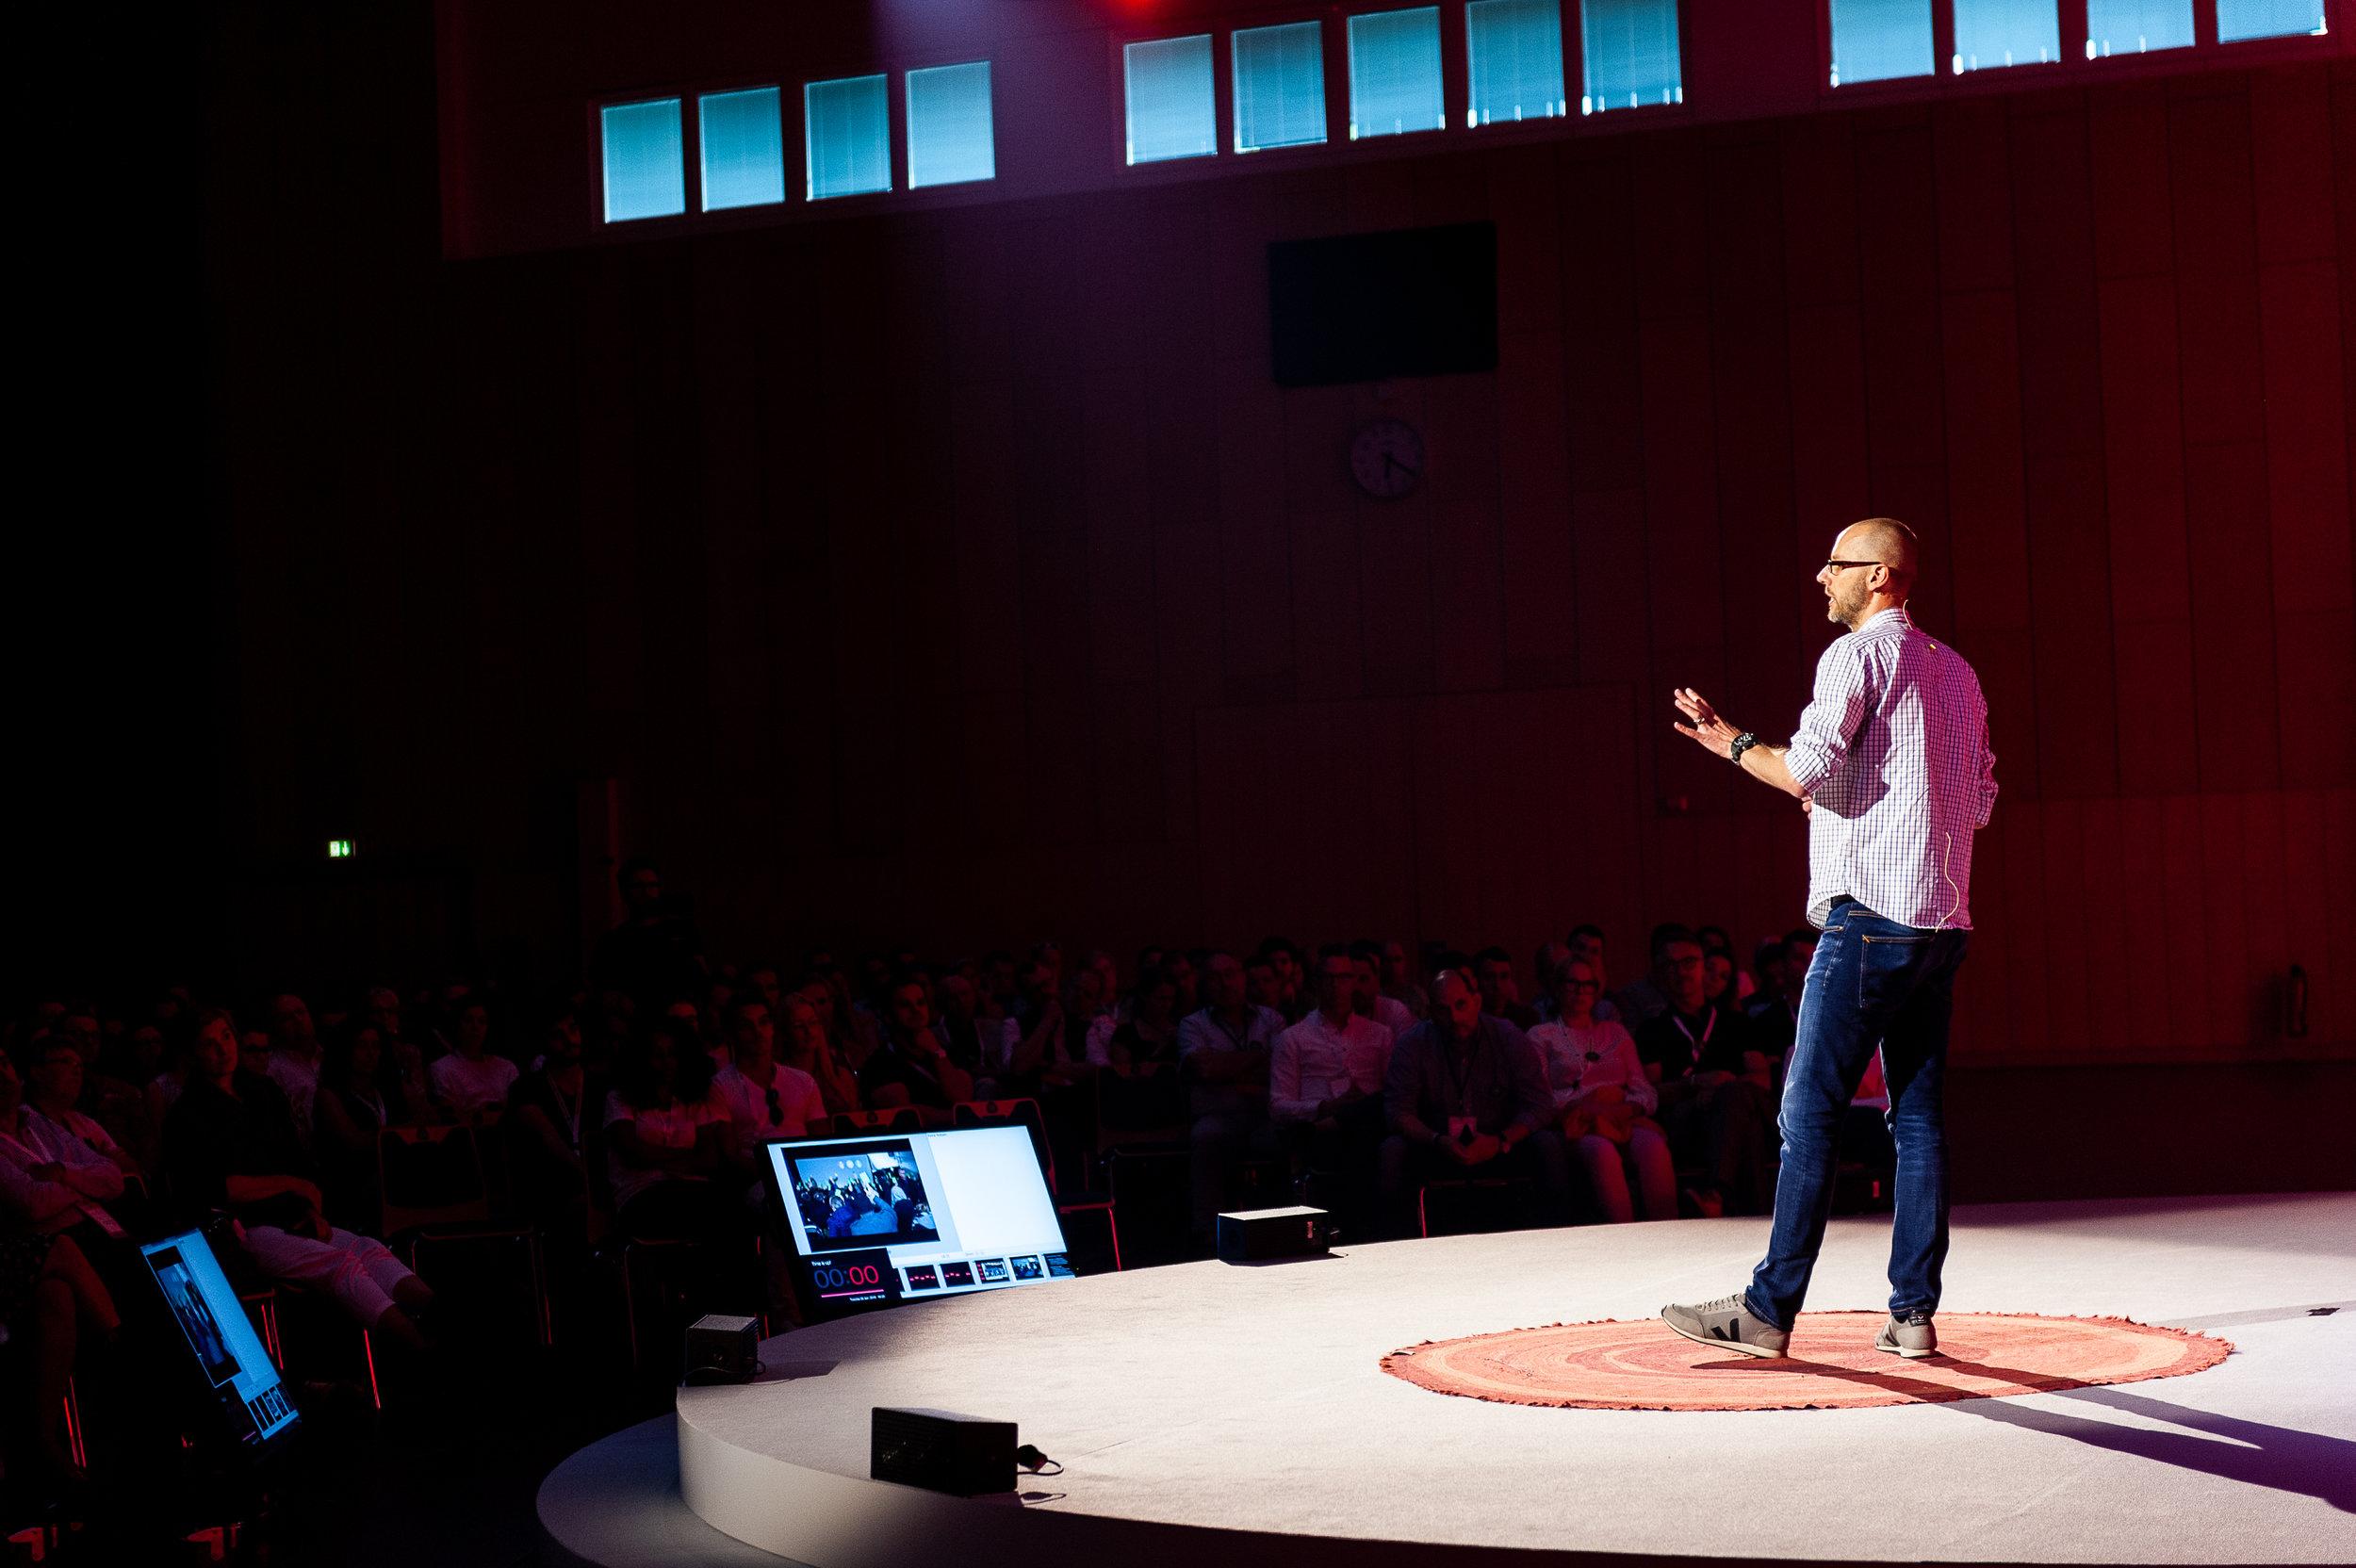 TEDx_MACH-180605-033.jpg